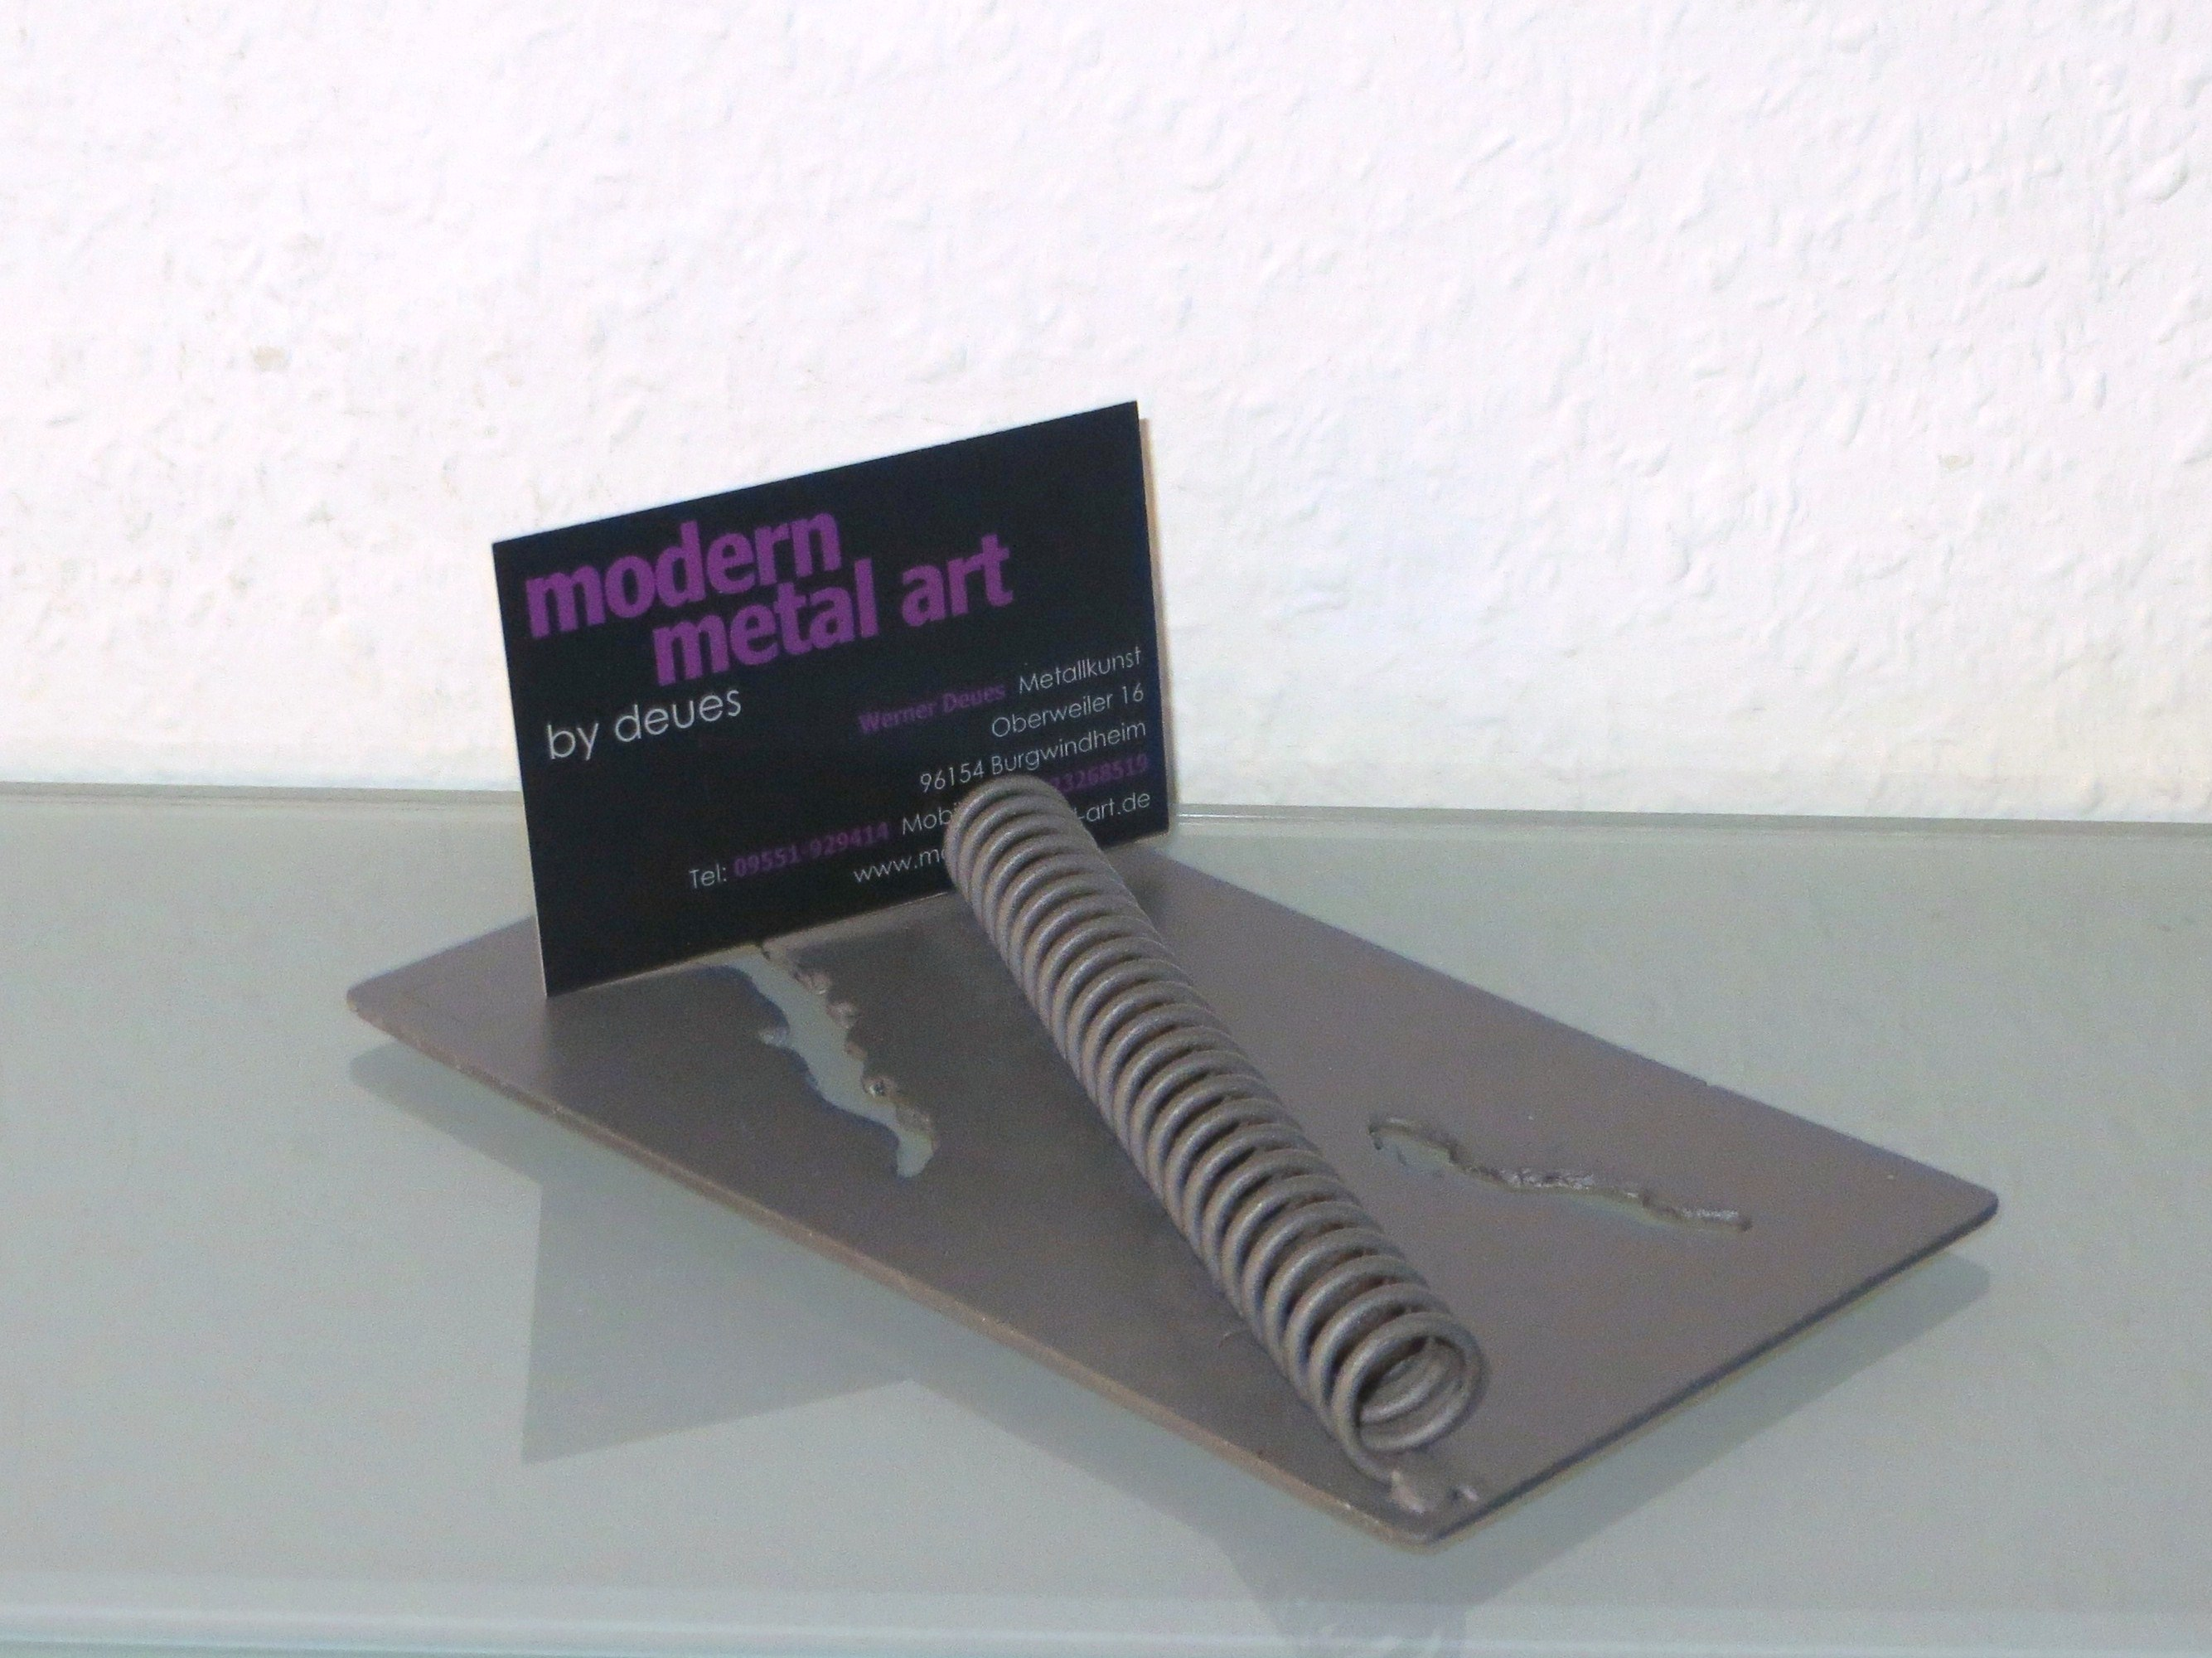 Business Modernmetalart